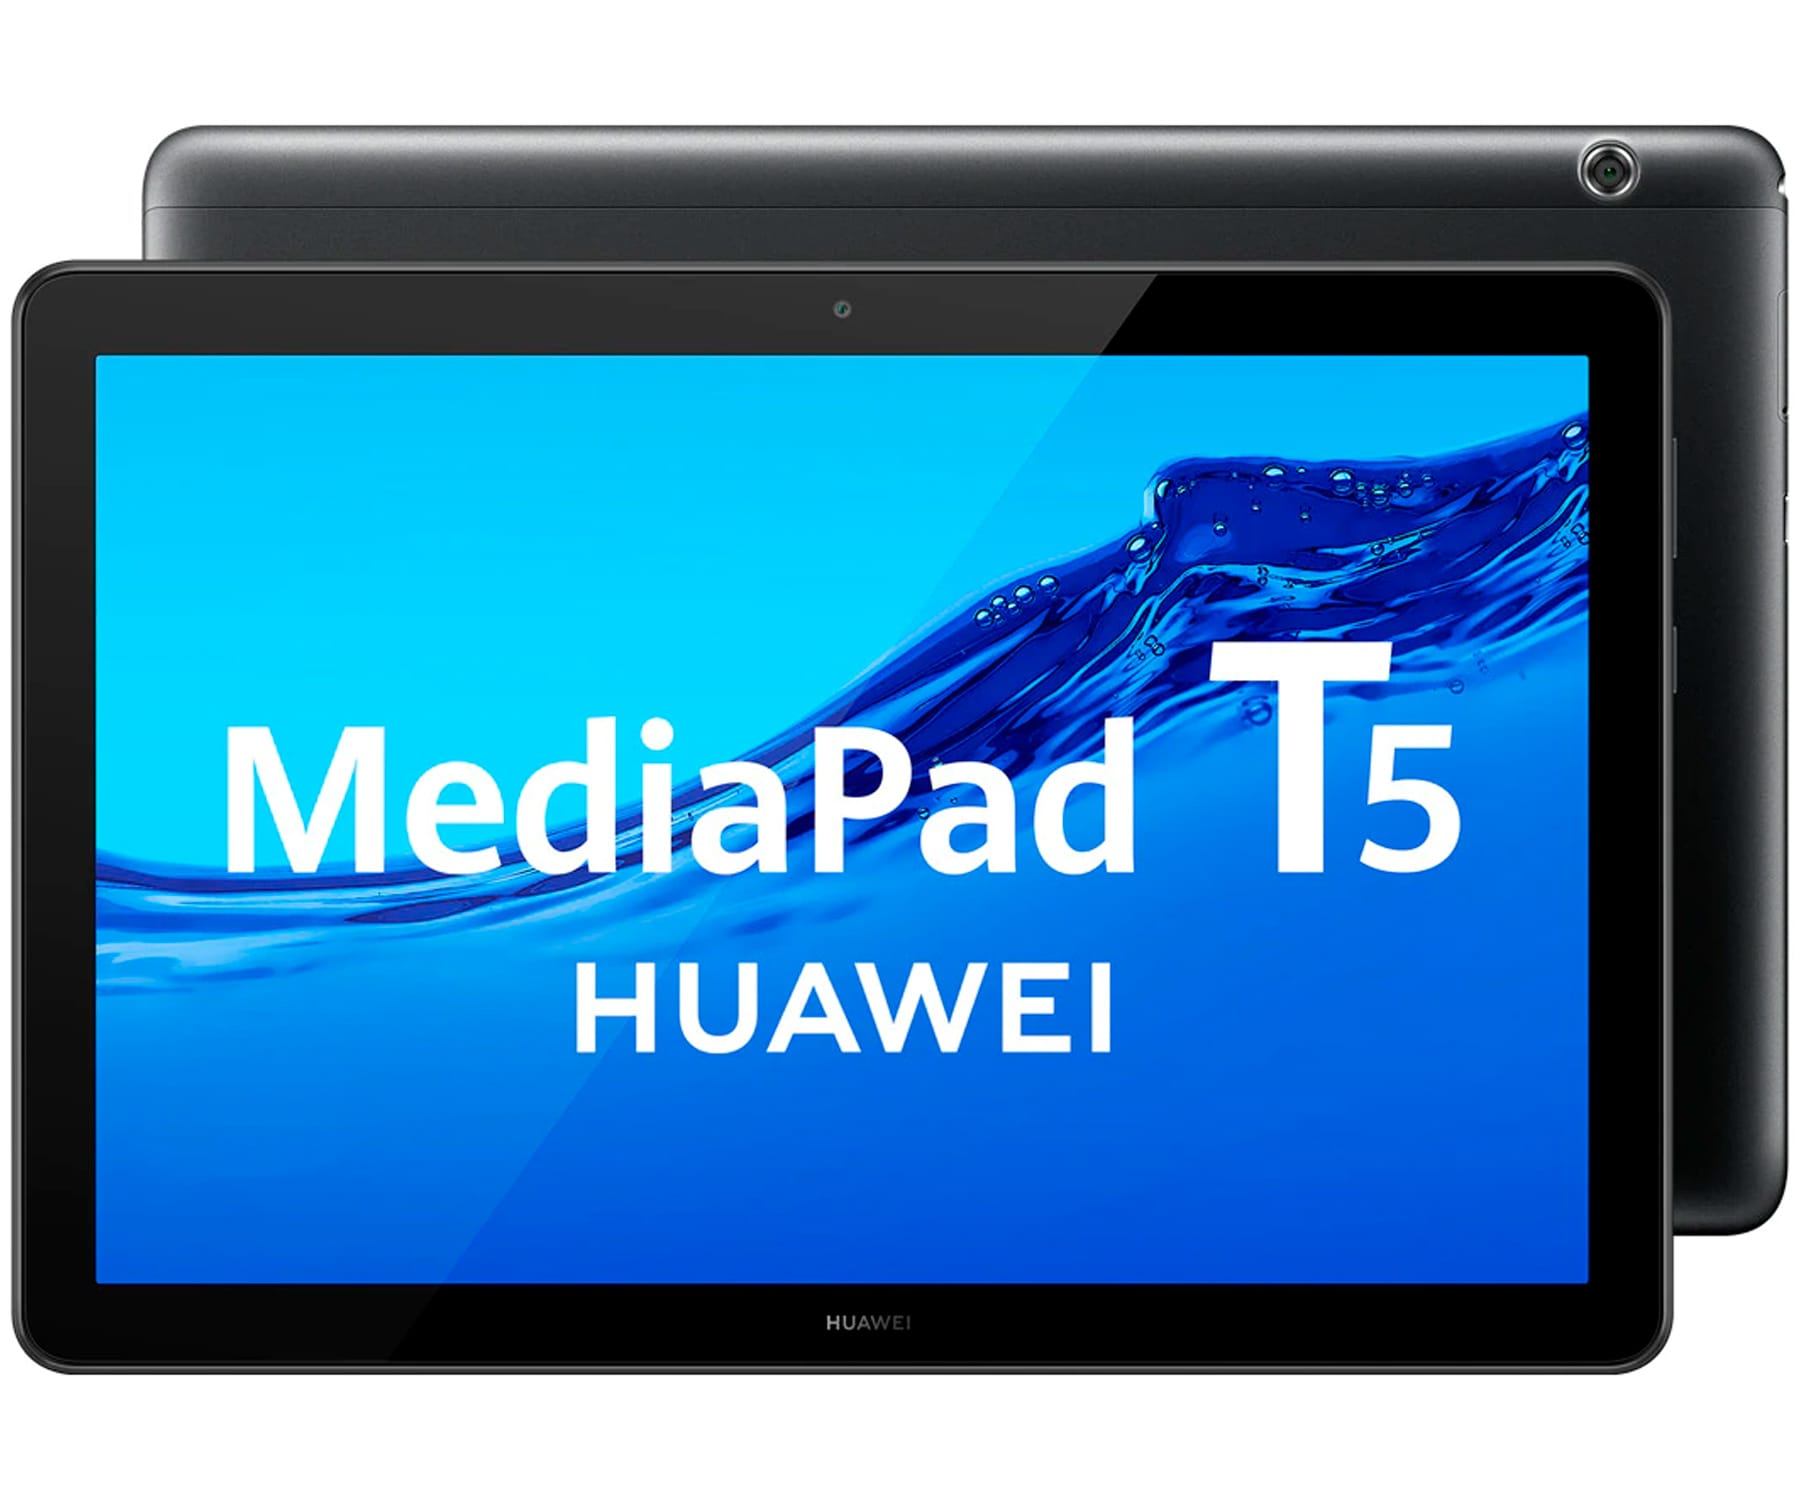 HUAWEI MEDIAPAD T5 NEGRO TABLET WIFI 10.1'' IPS FULLHD OCTACORE 32GB 2GB RAM CAM 5MP SELFIES 2MP